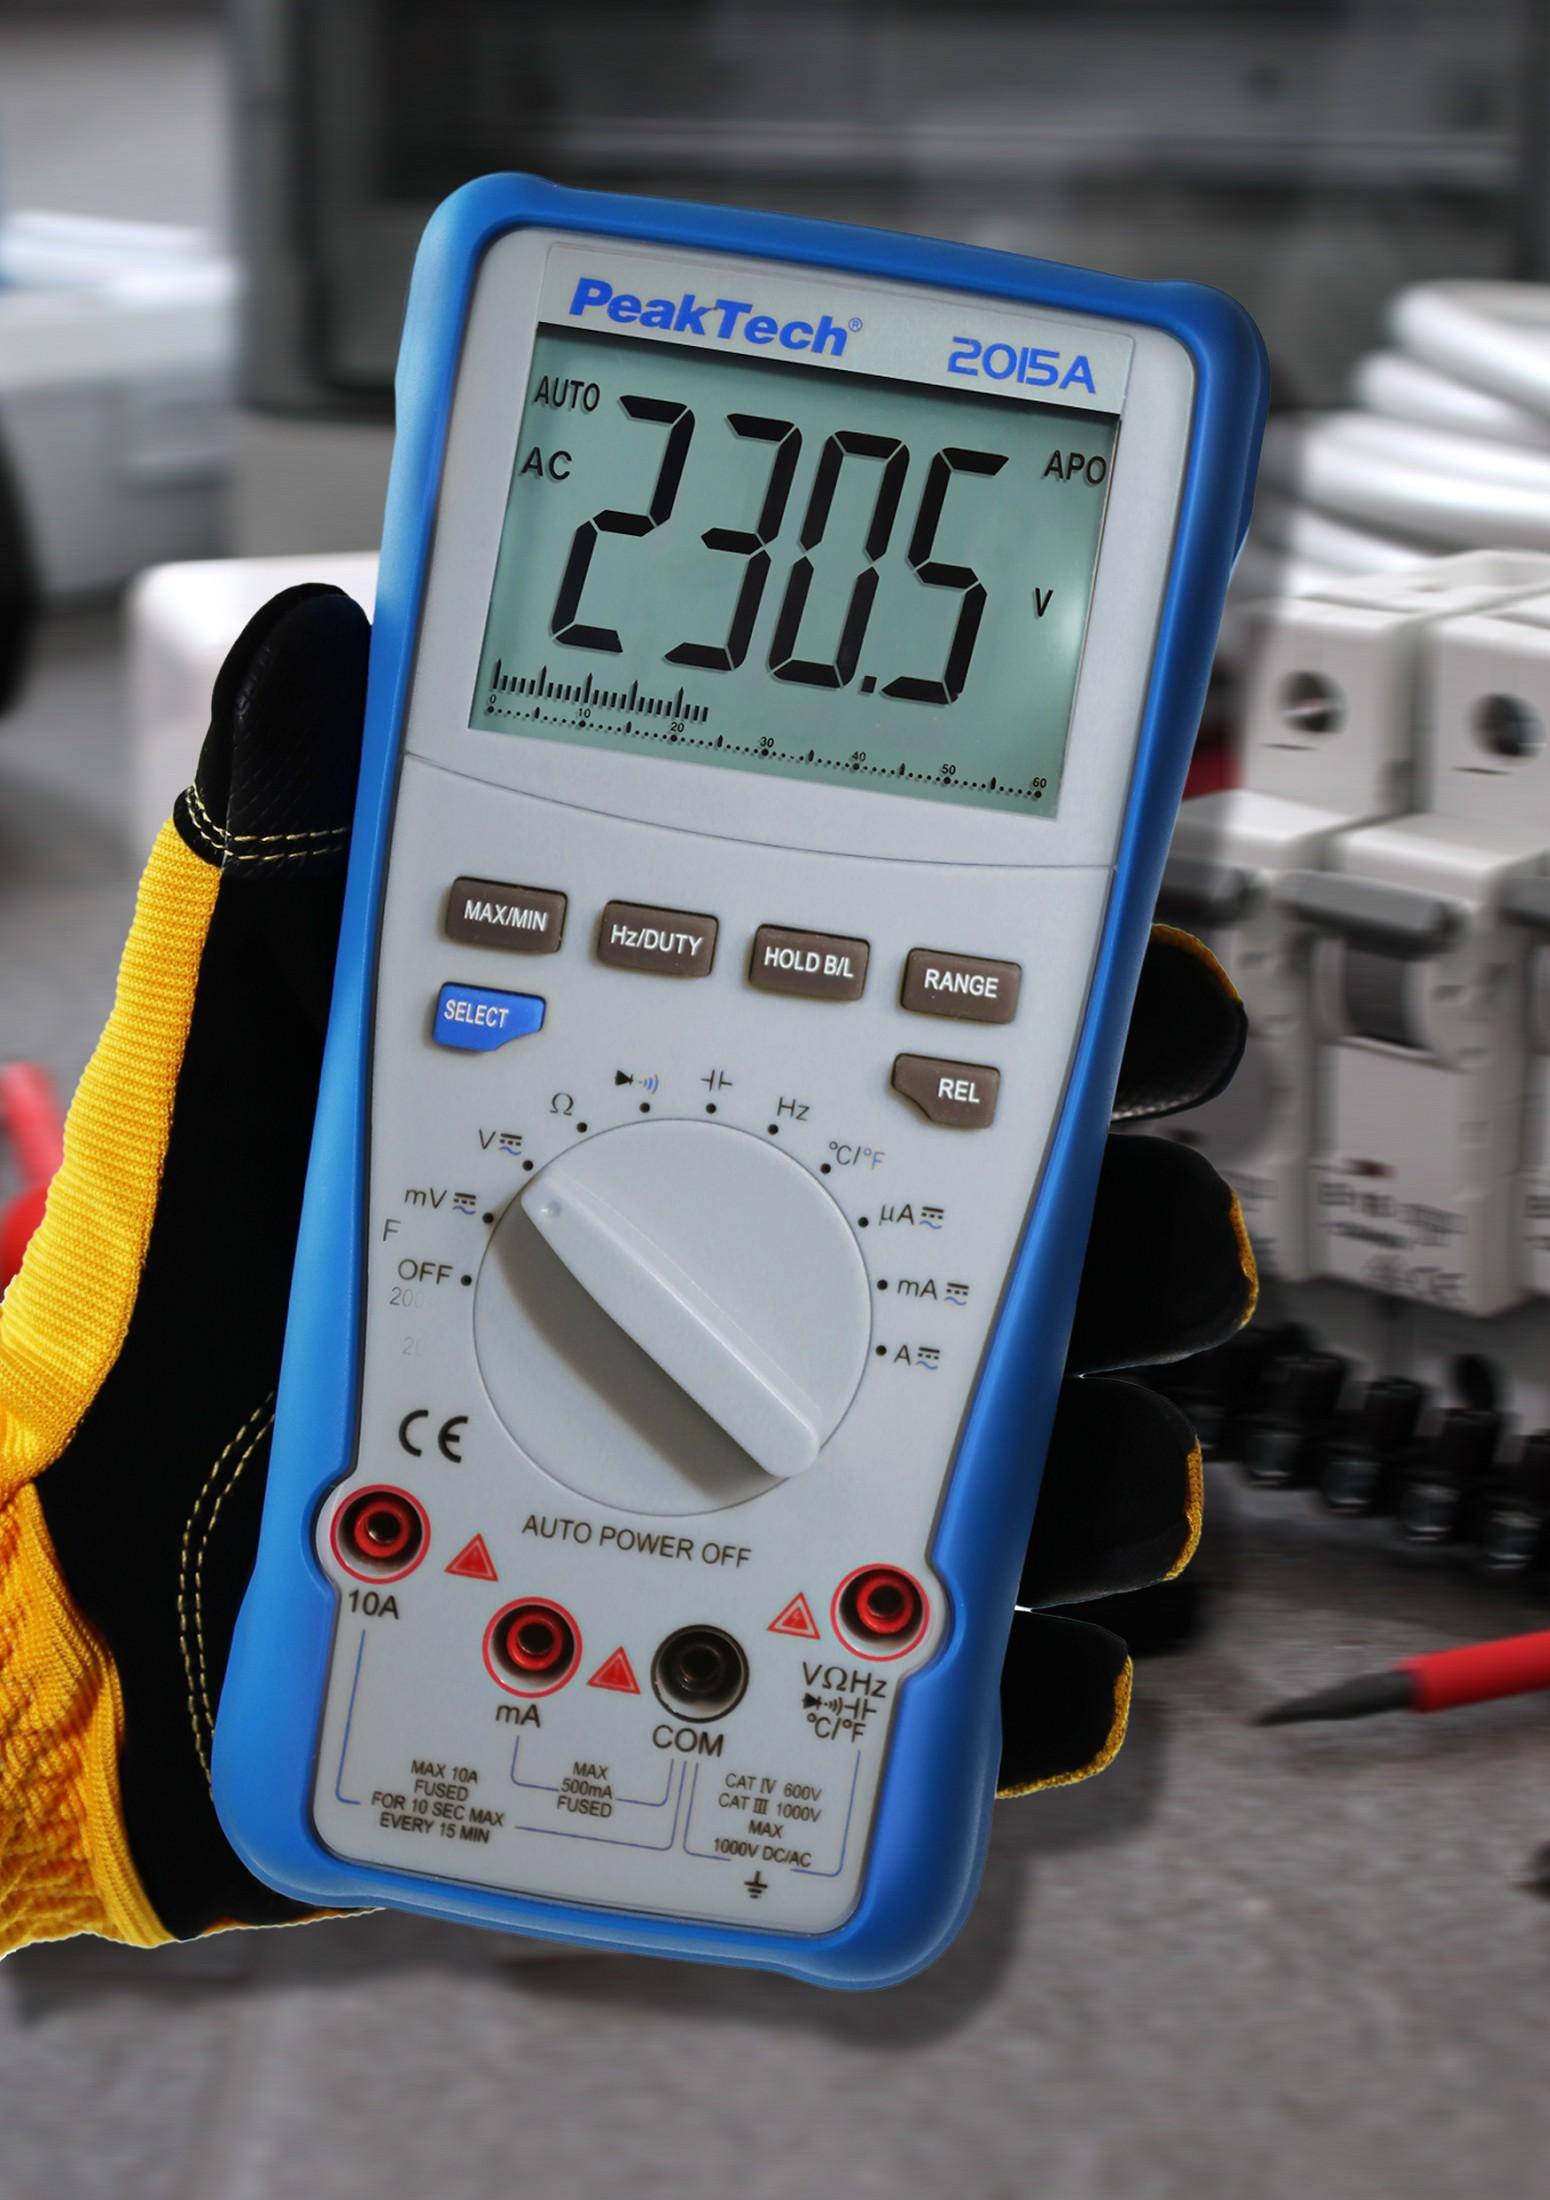 «PeakTech® P 2015 A» True RMS 1000 V digital multimeter 4000 Counts